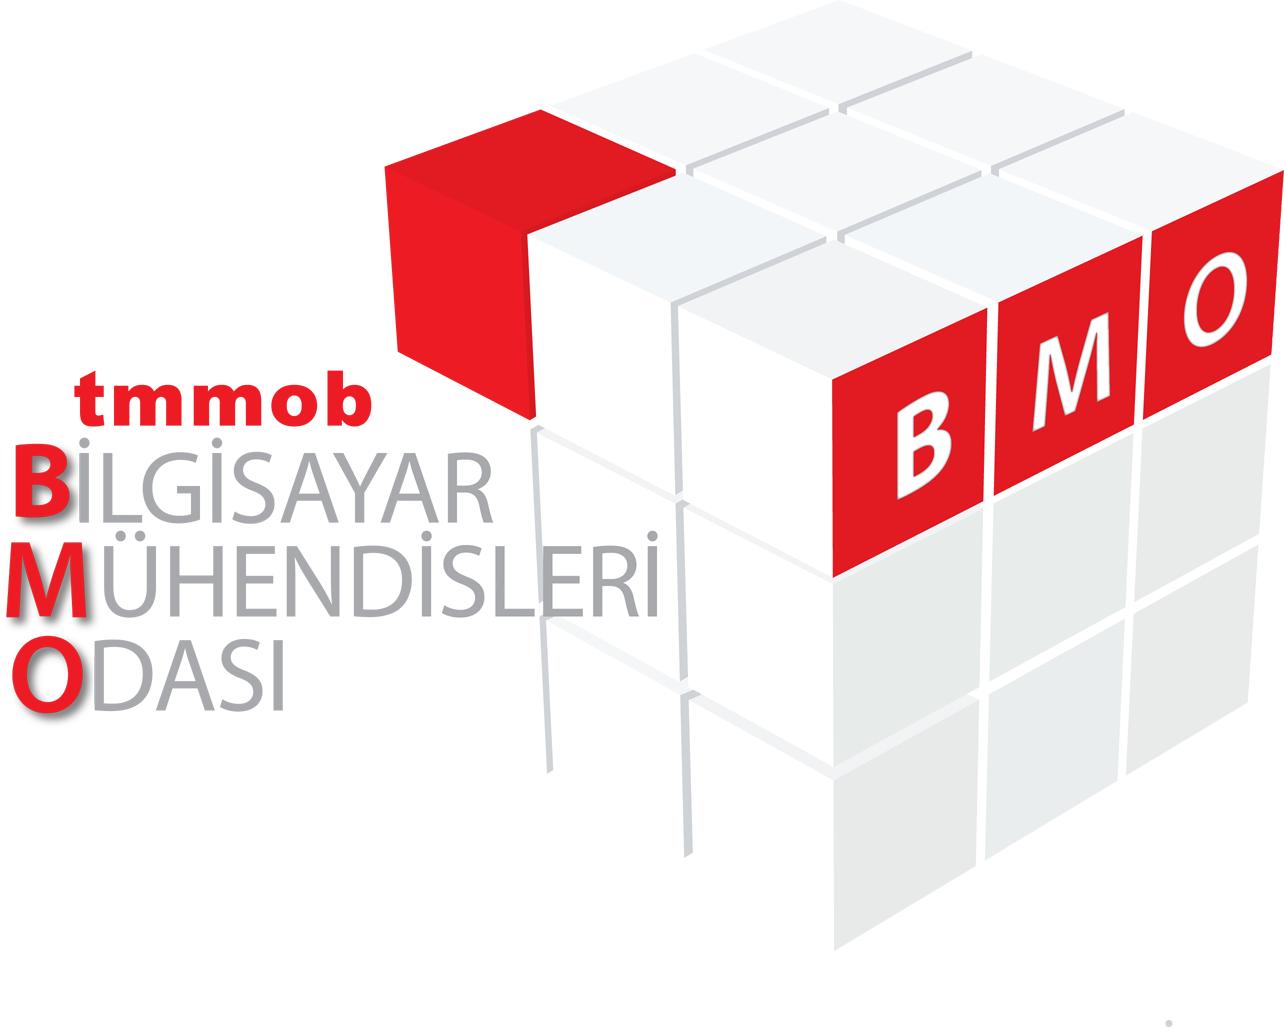 BMO-LOGO-